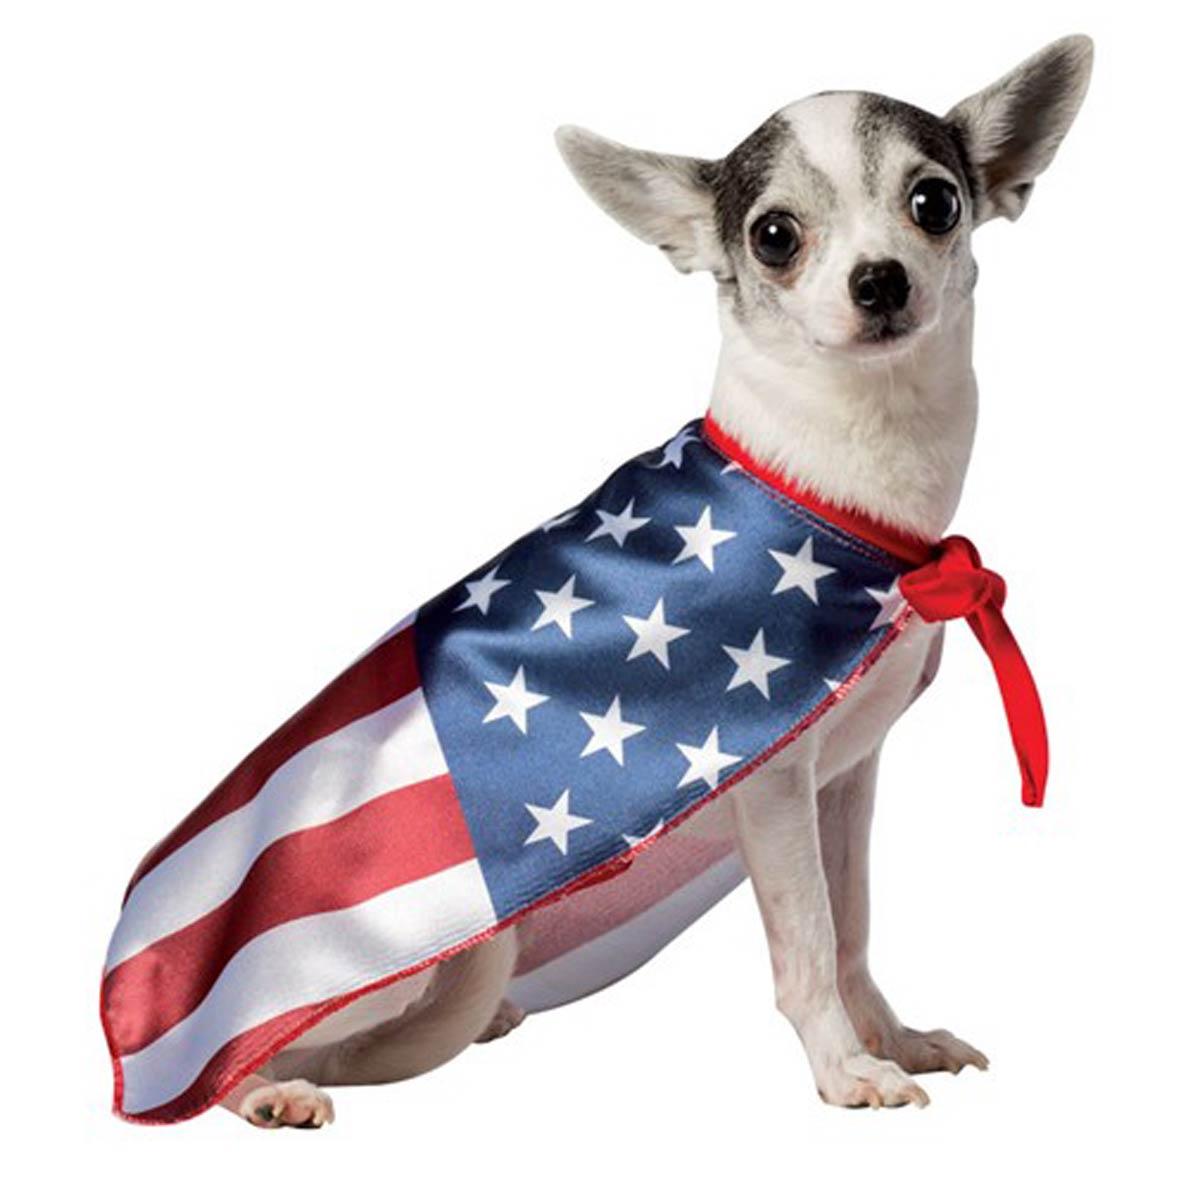 USA Flag Cape Dog Costume by Rasta Imposta